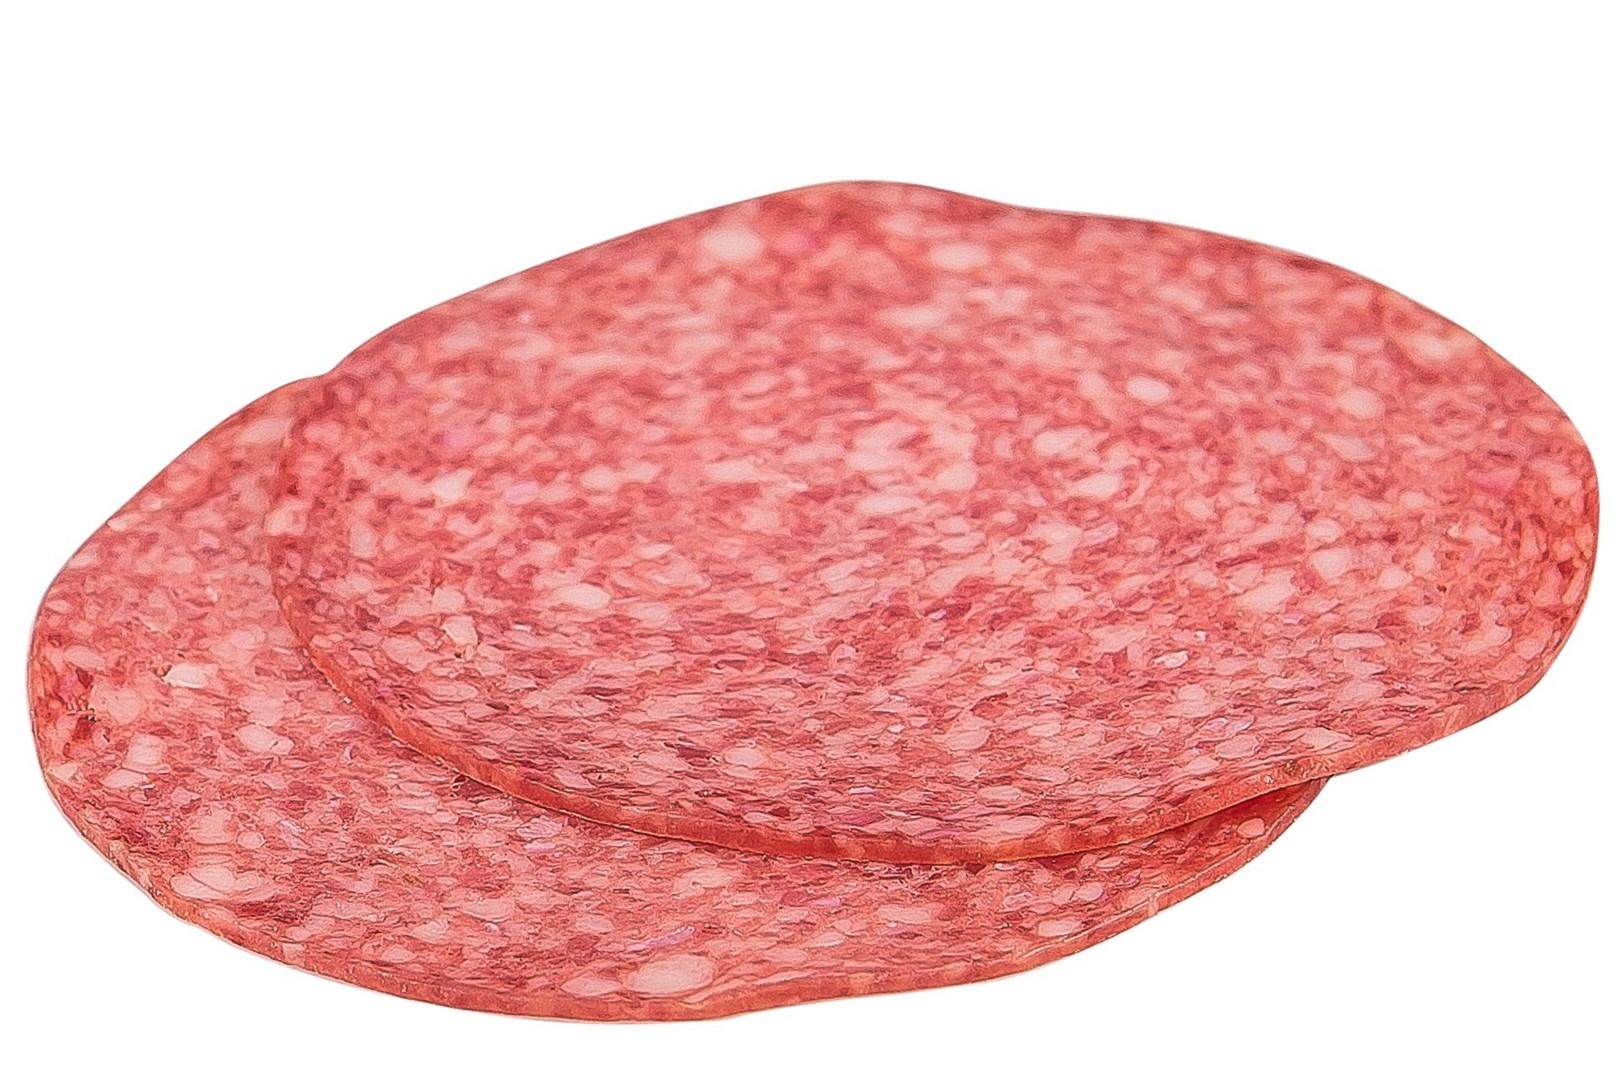 Productafbeelding Salami Siciliano 5x2pl